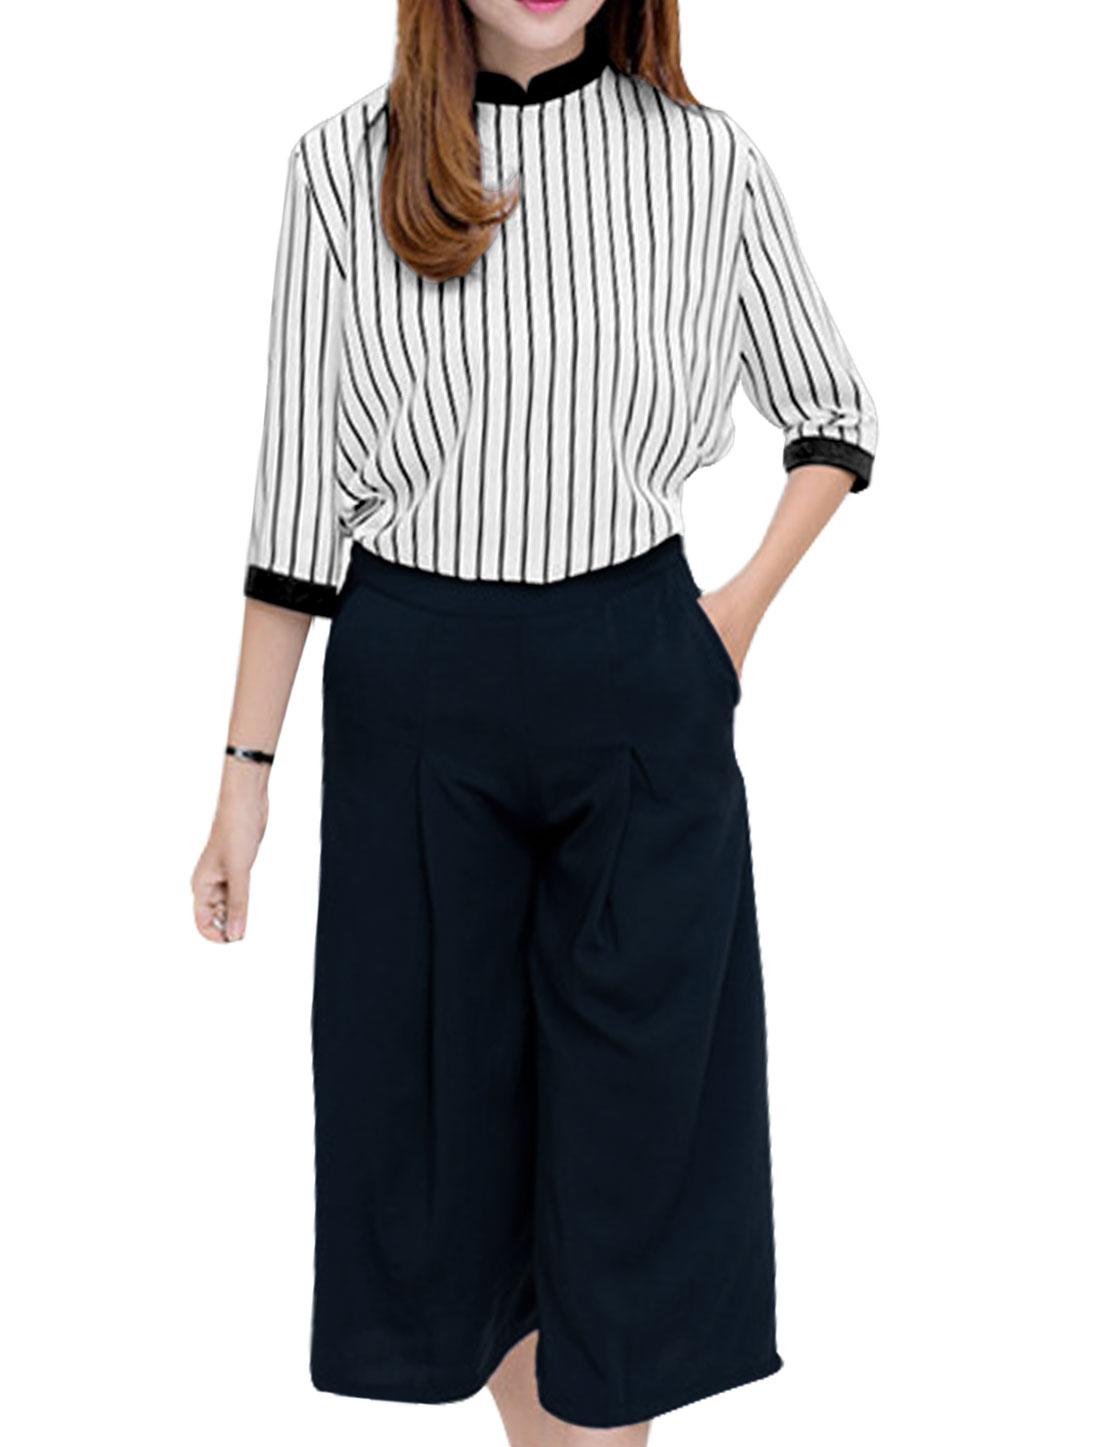 Allegra K Women's Vertical Stripes Top w Wide Leg Capris Pants Sets White Dark Blue (Size M / 8)